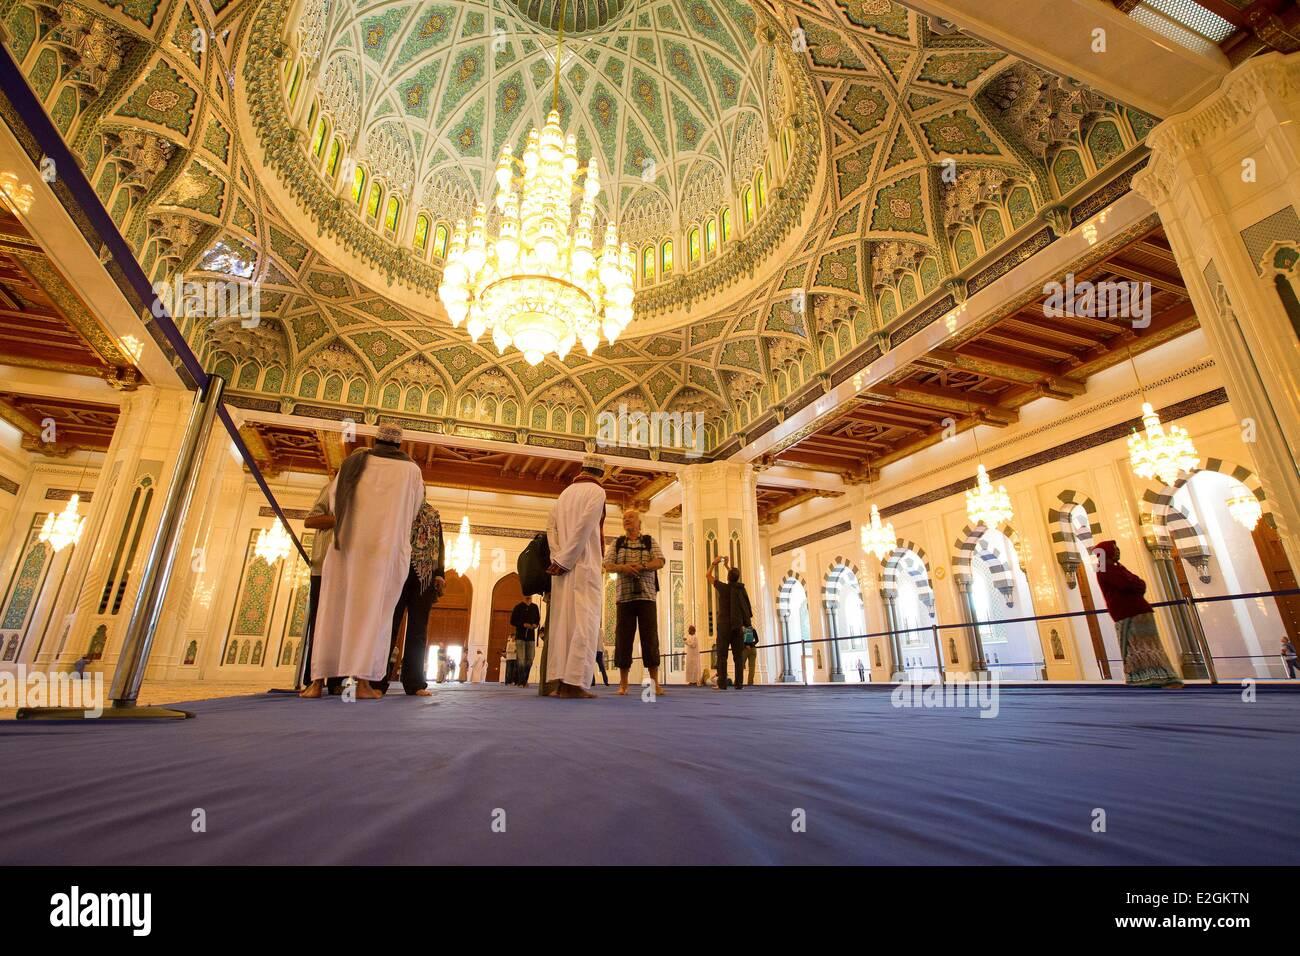 Grand Mosque In Mu Sultan Qaboos Chandelier